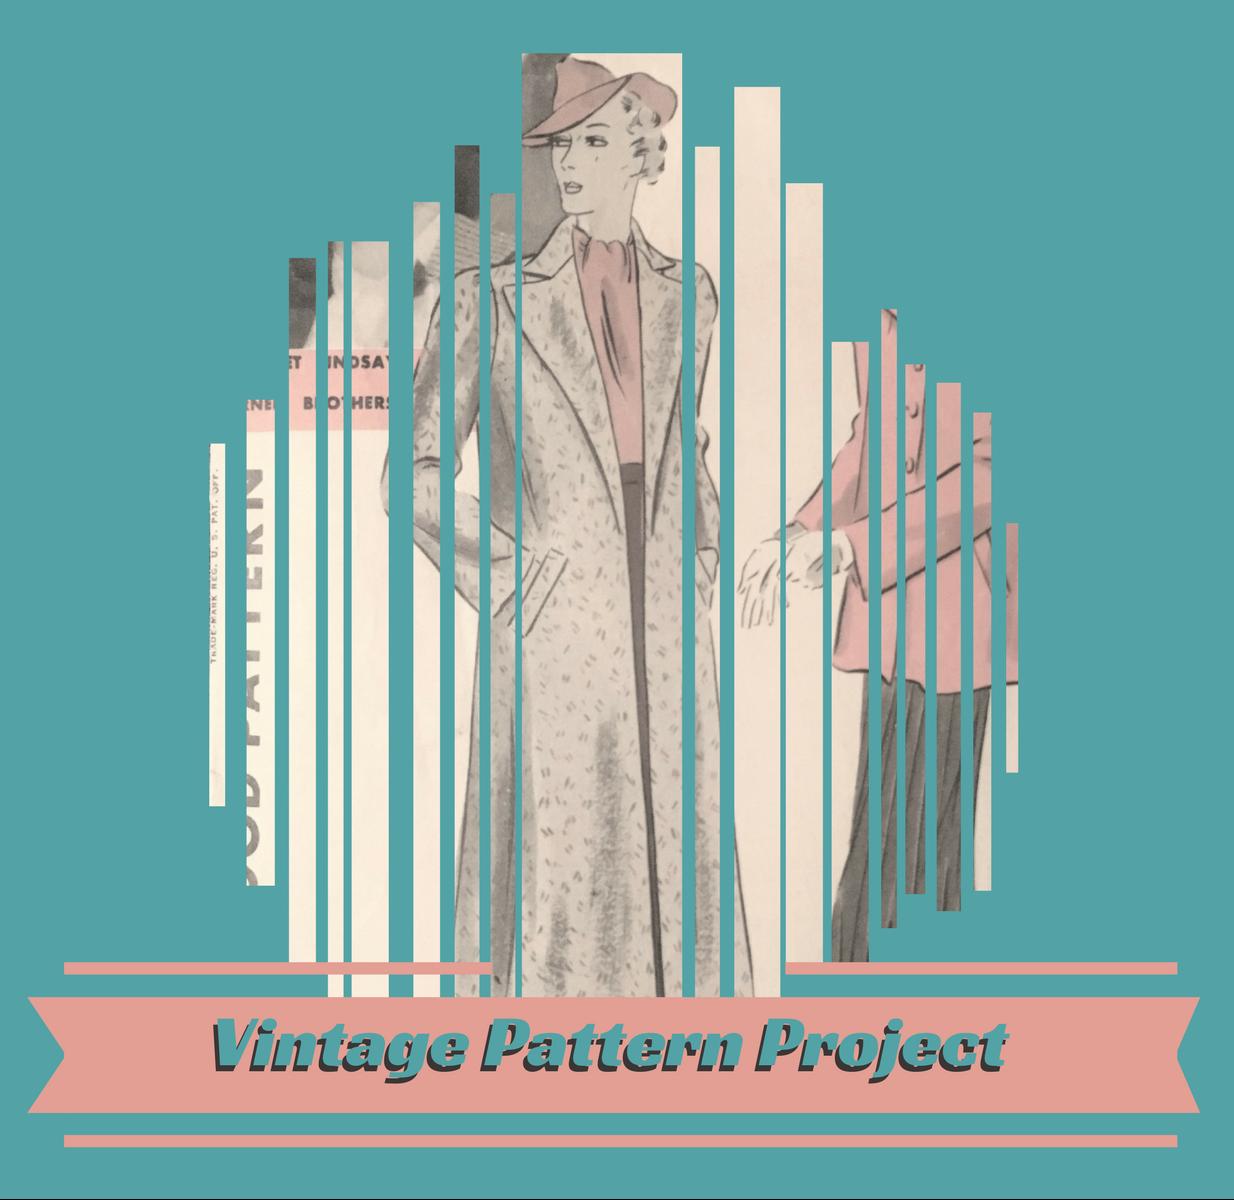 Vintage Pattern Project